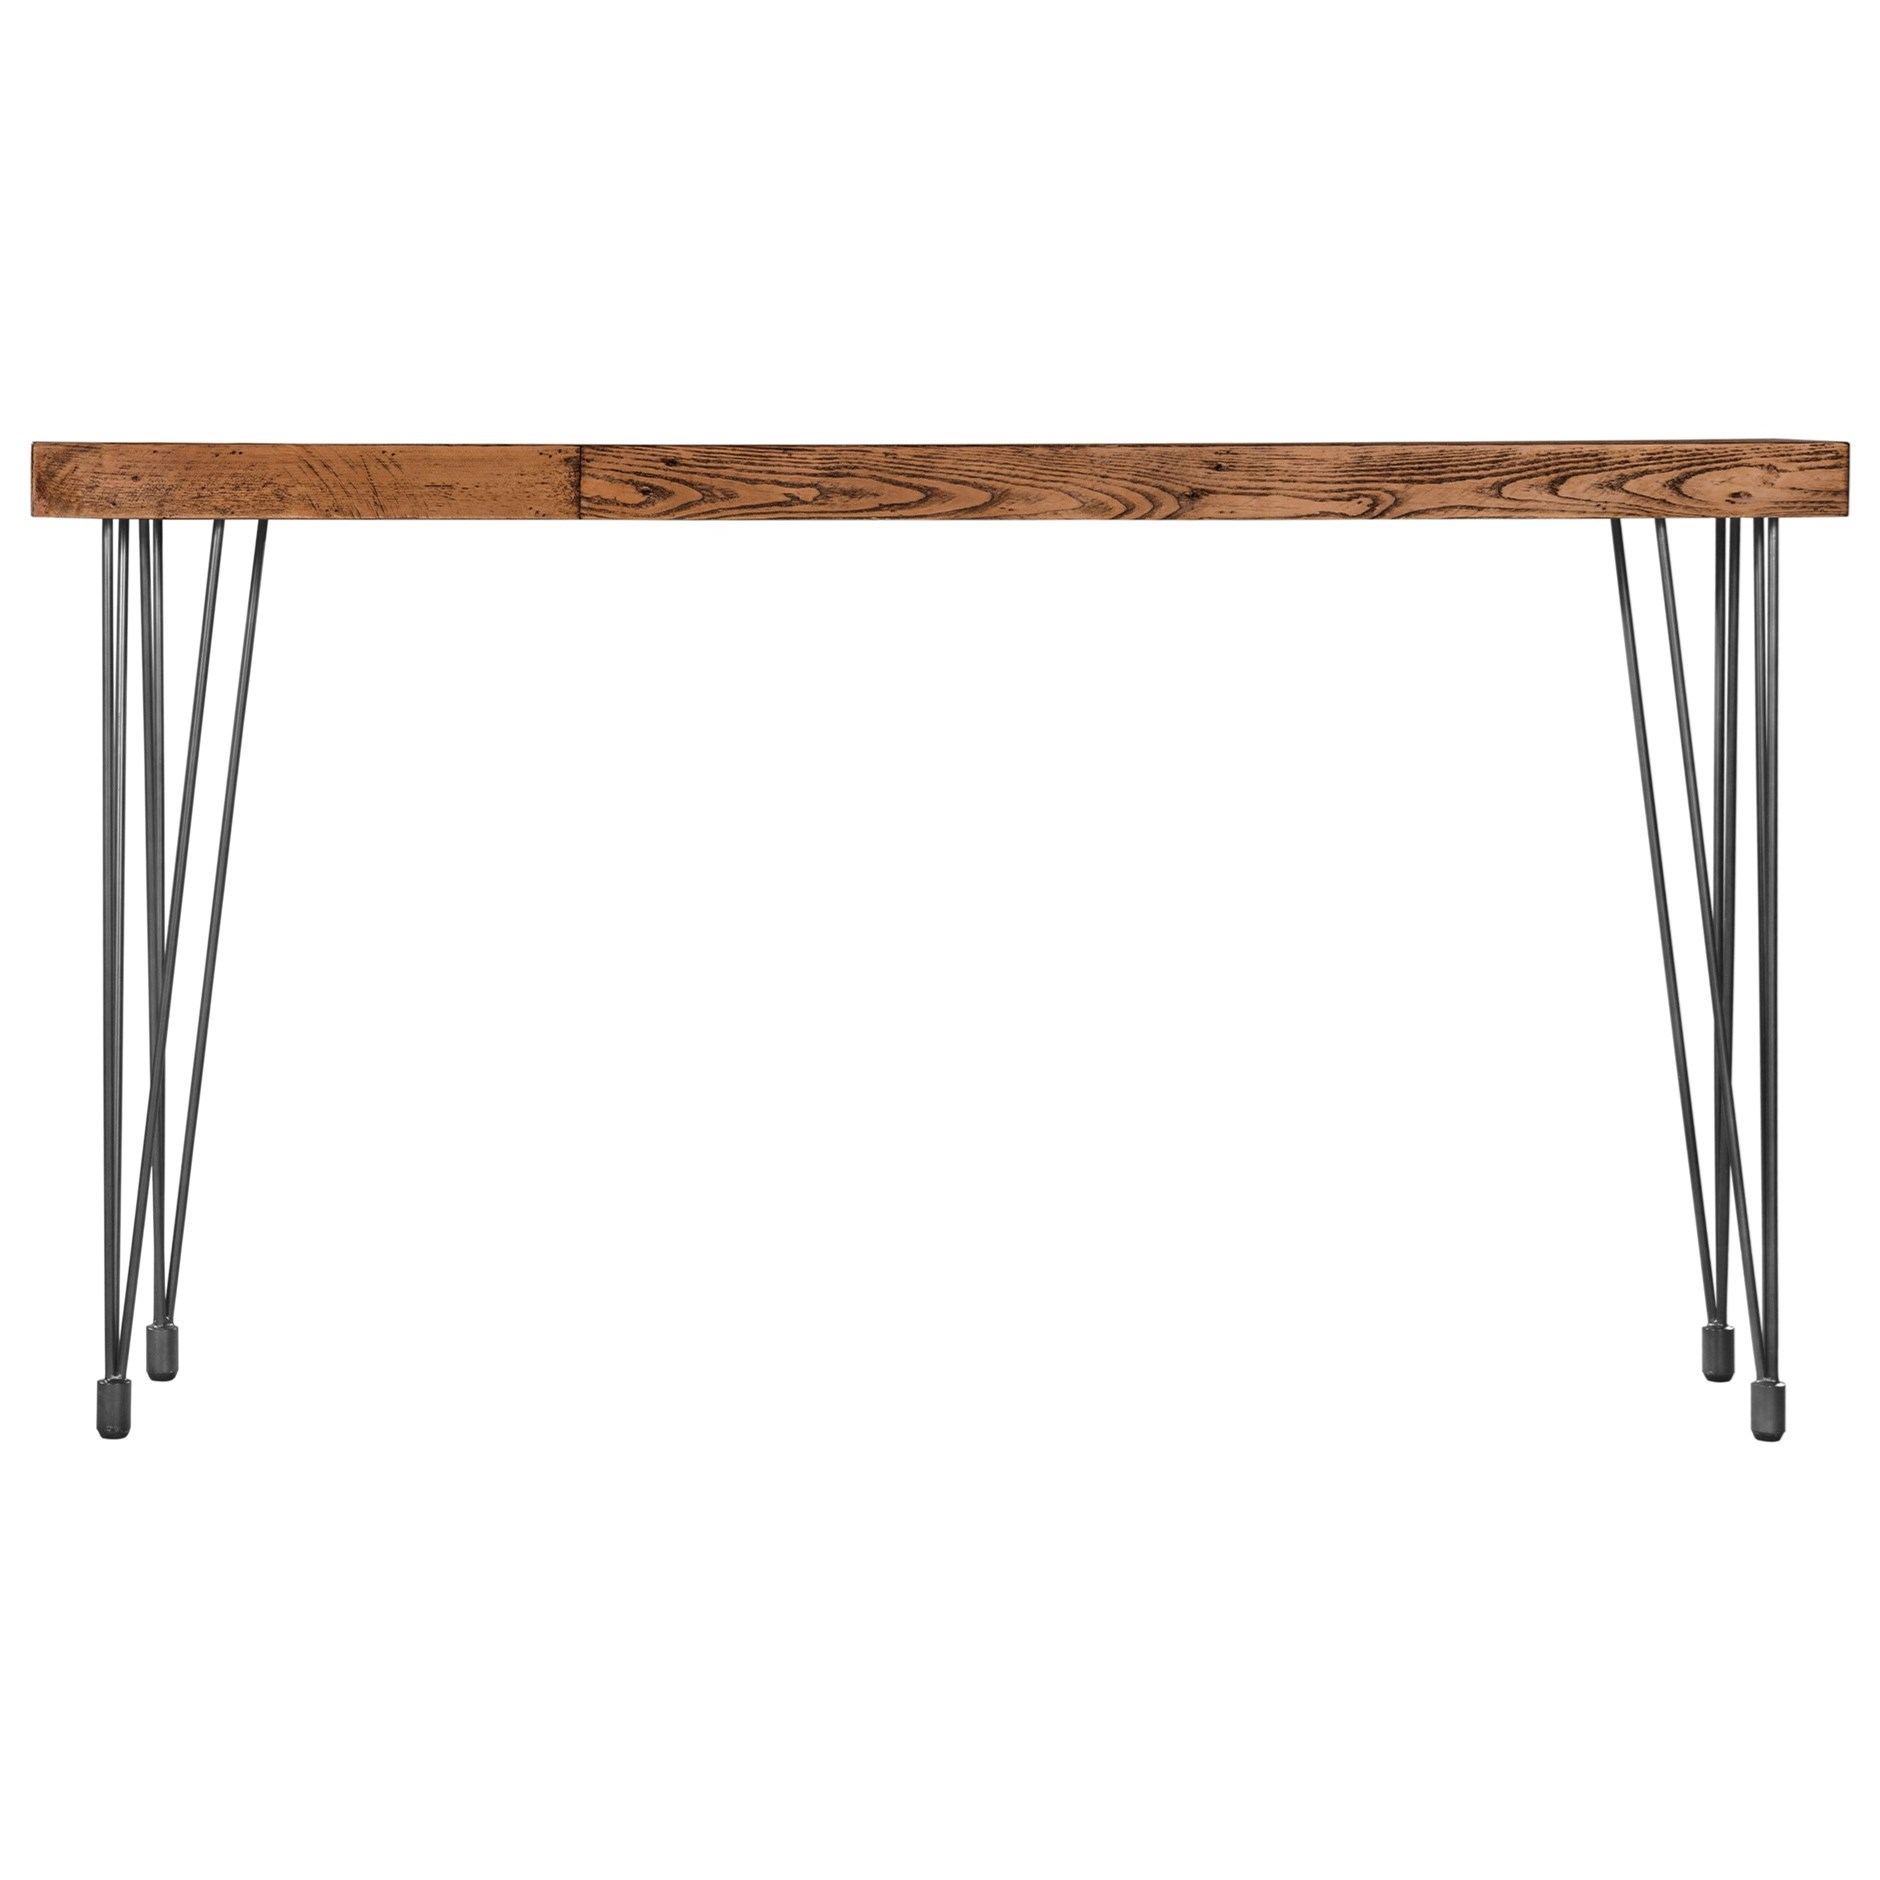 Boneta Recycled Pine Console Table at Sadler's Home Furnishings